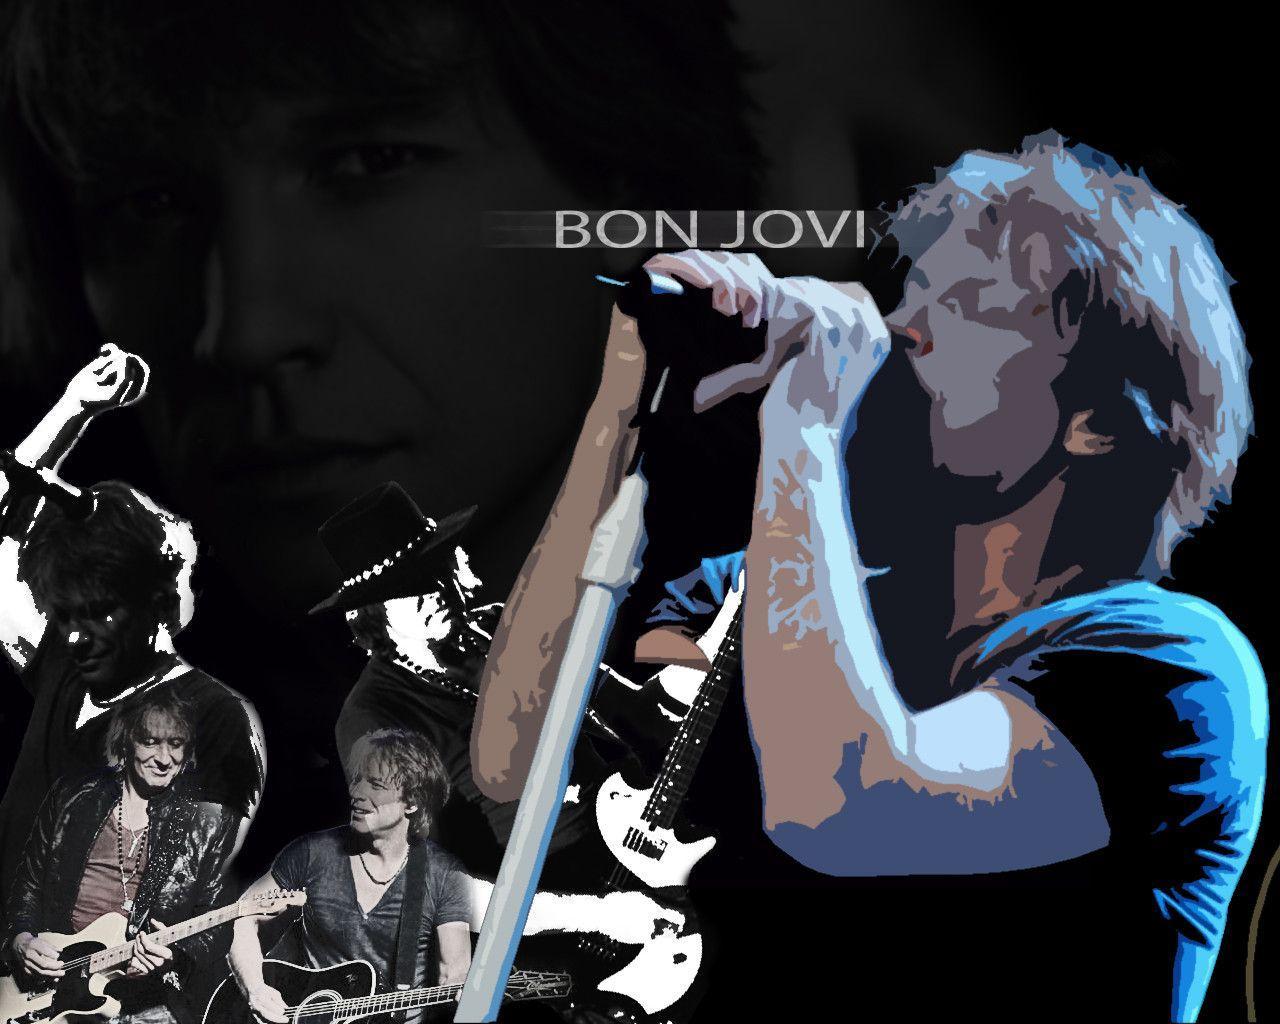 bon jovi wallpaper - photo #6